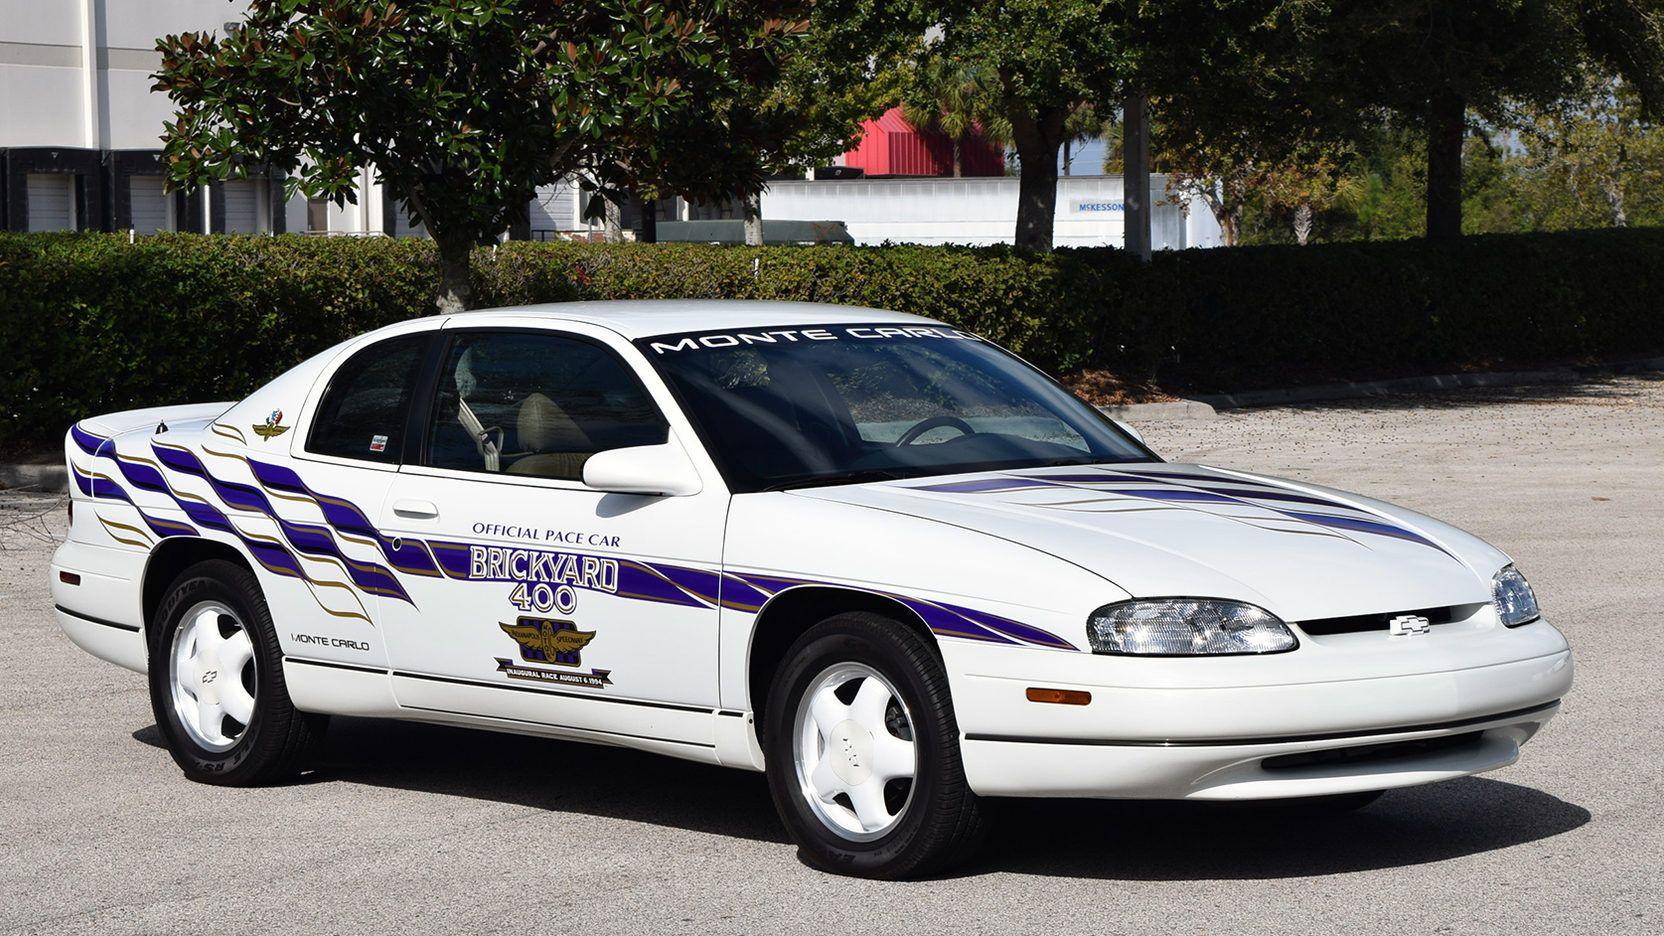 1995 Chevrolet Monte Carlo Pace Car Edition Chevrolet Monte Carlo Chevrolet Monte Carlo